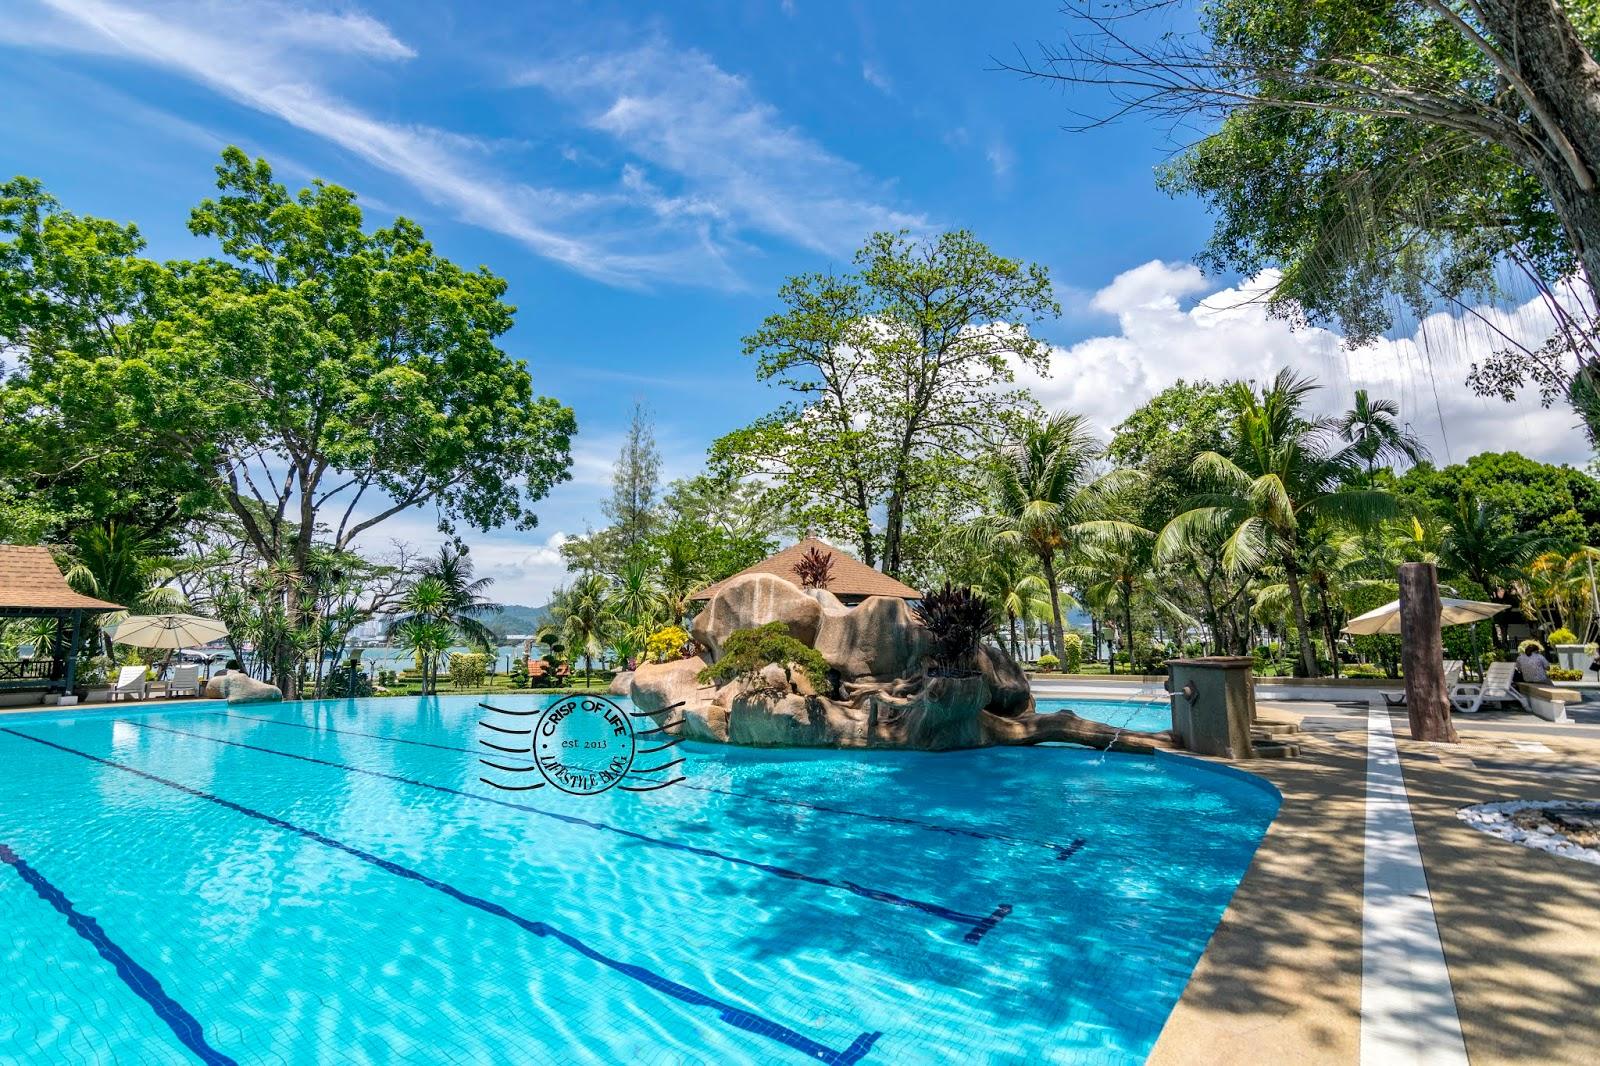 Pantai Jerejak Island Resort